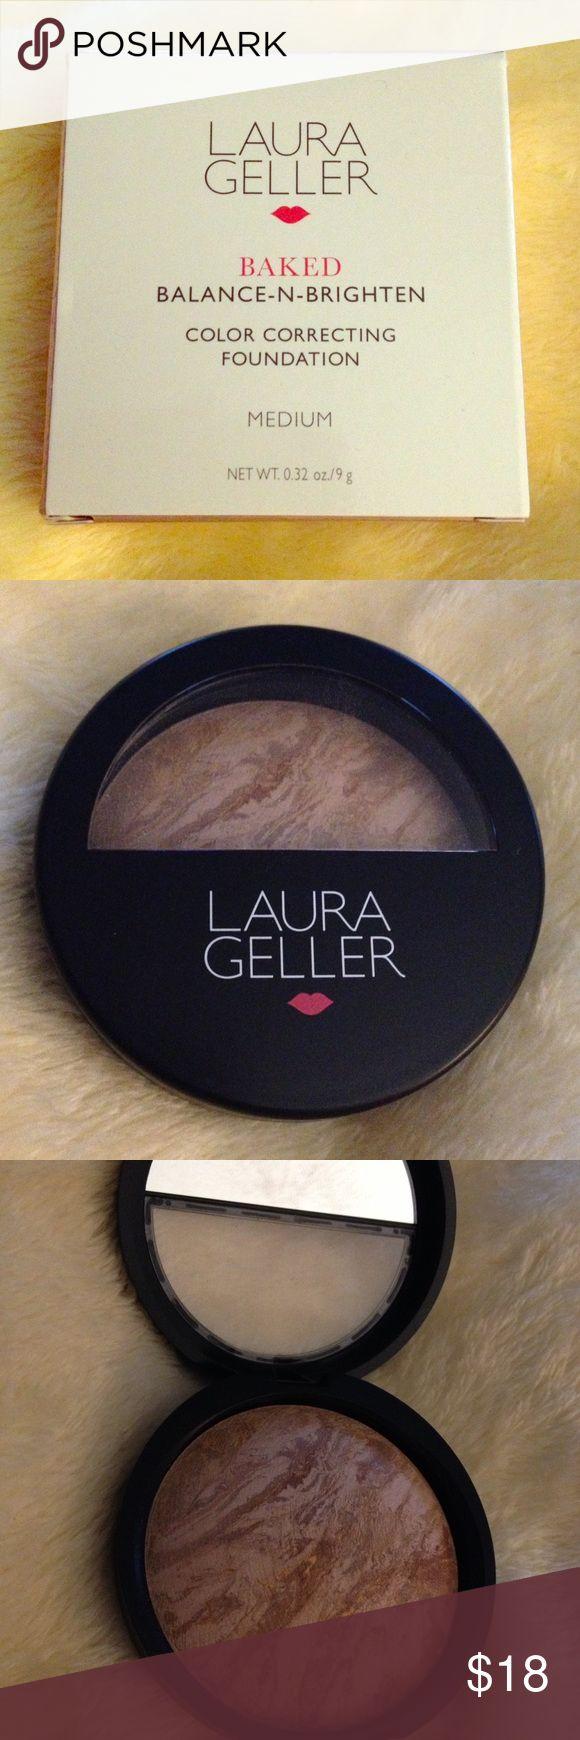 Laura Geller balance-n-brighten New! Medium shade color correcting foundation Laura Geller Makeup Foundation